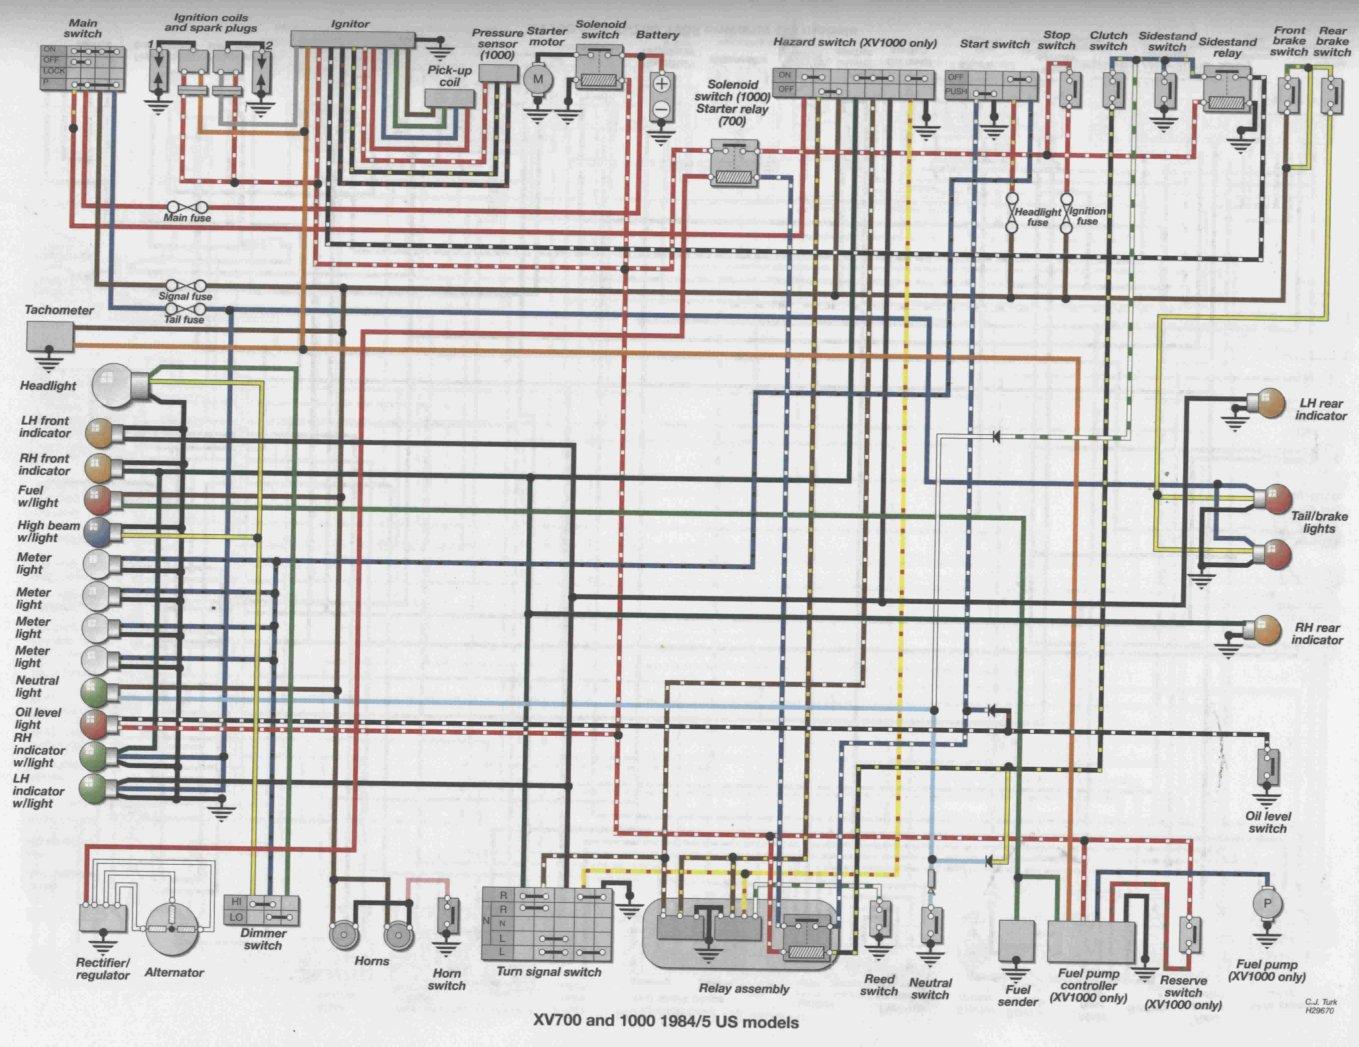 2000 yamaha yzf600r headlight wiring diagram yzf 600